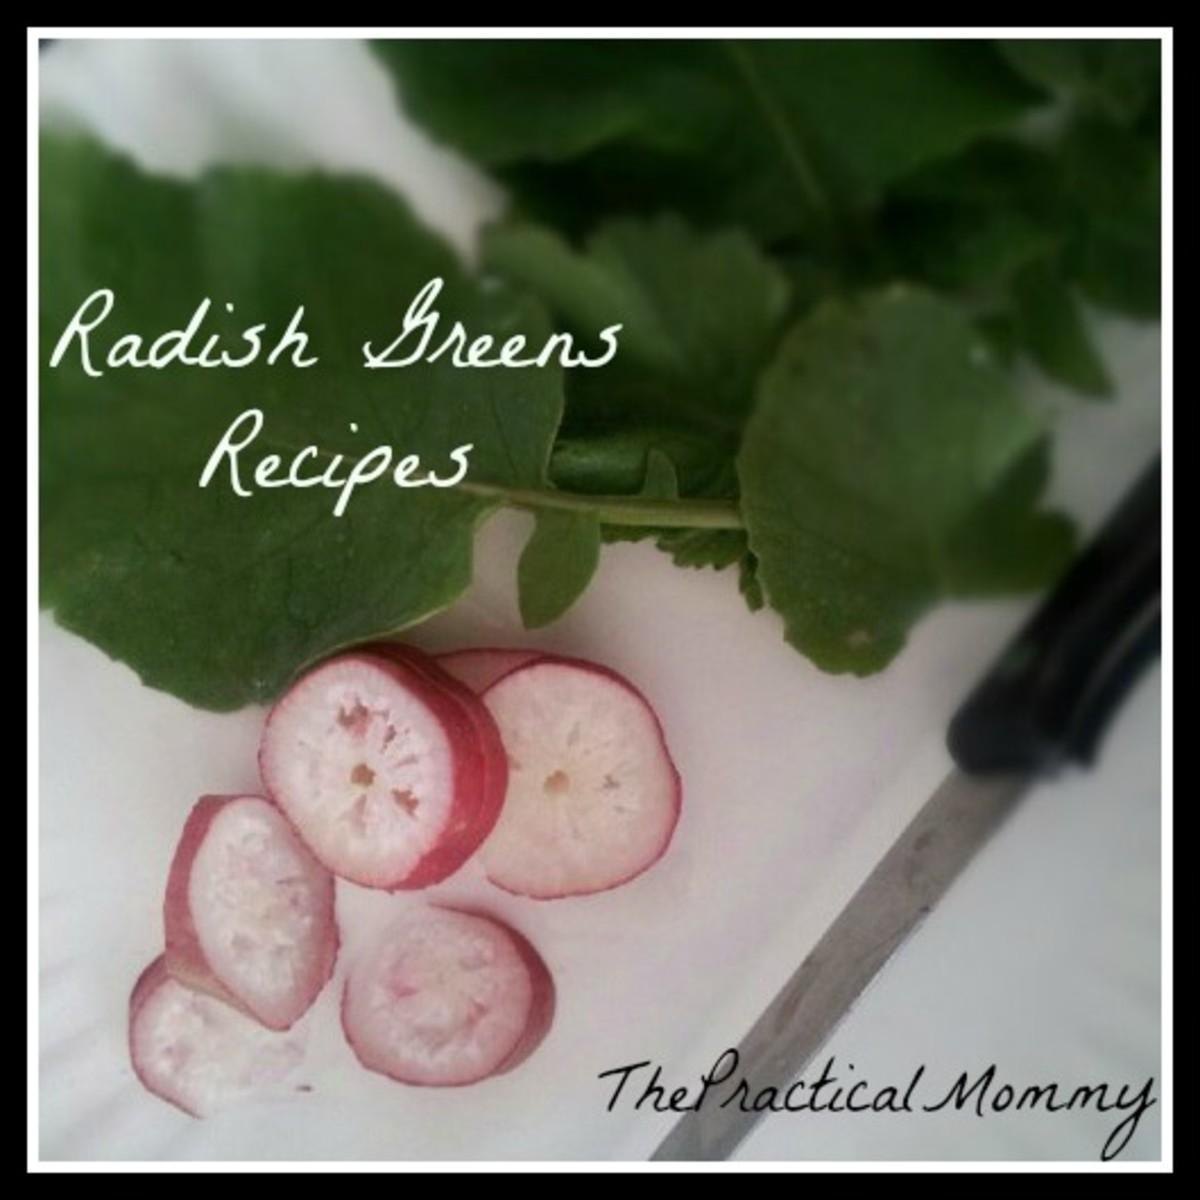 Delicious and nutritious radish greens recipes delishably